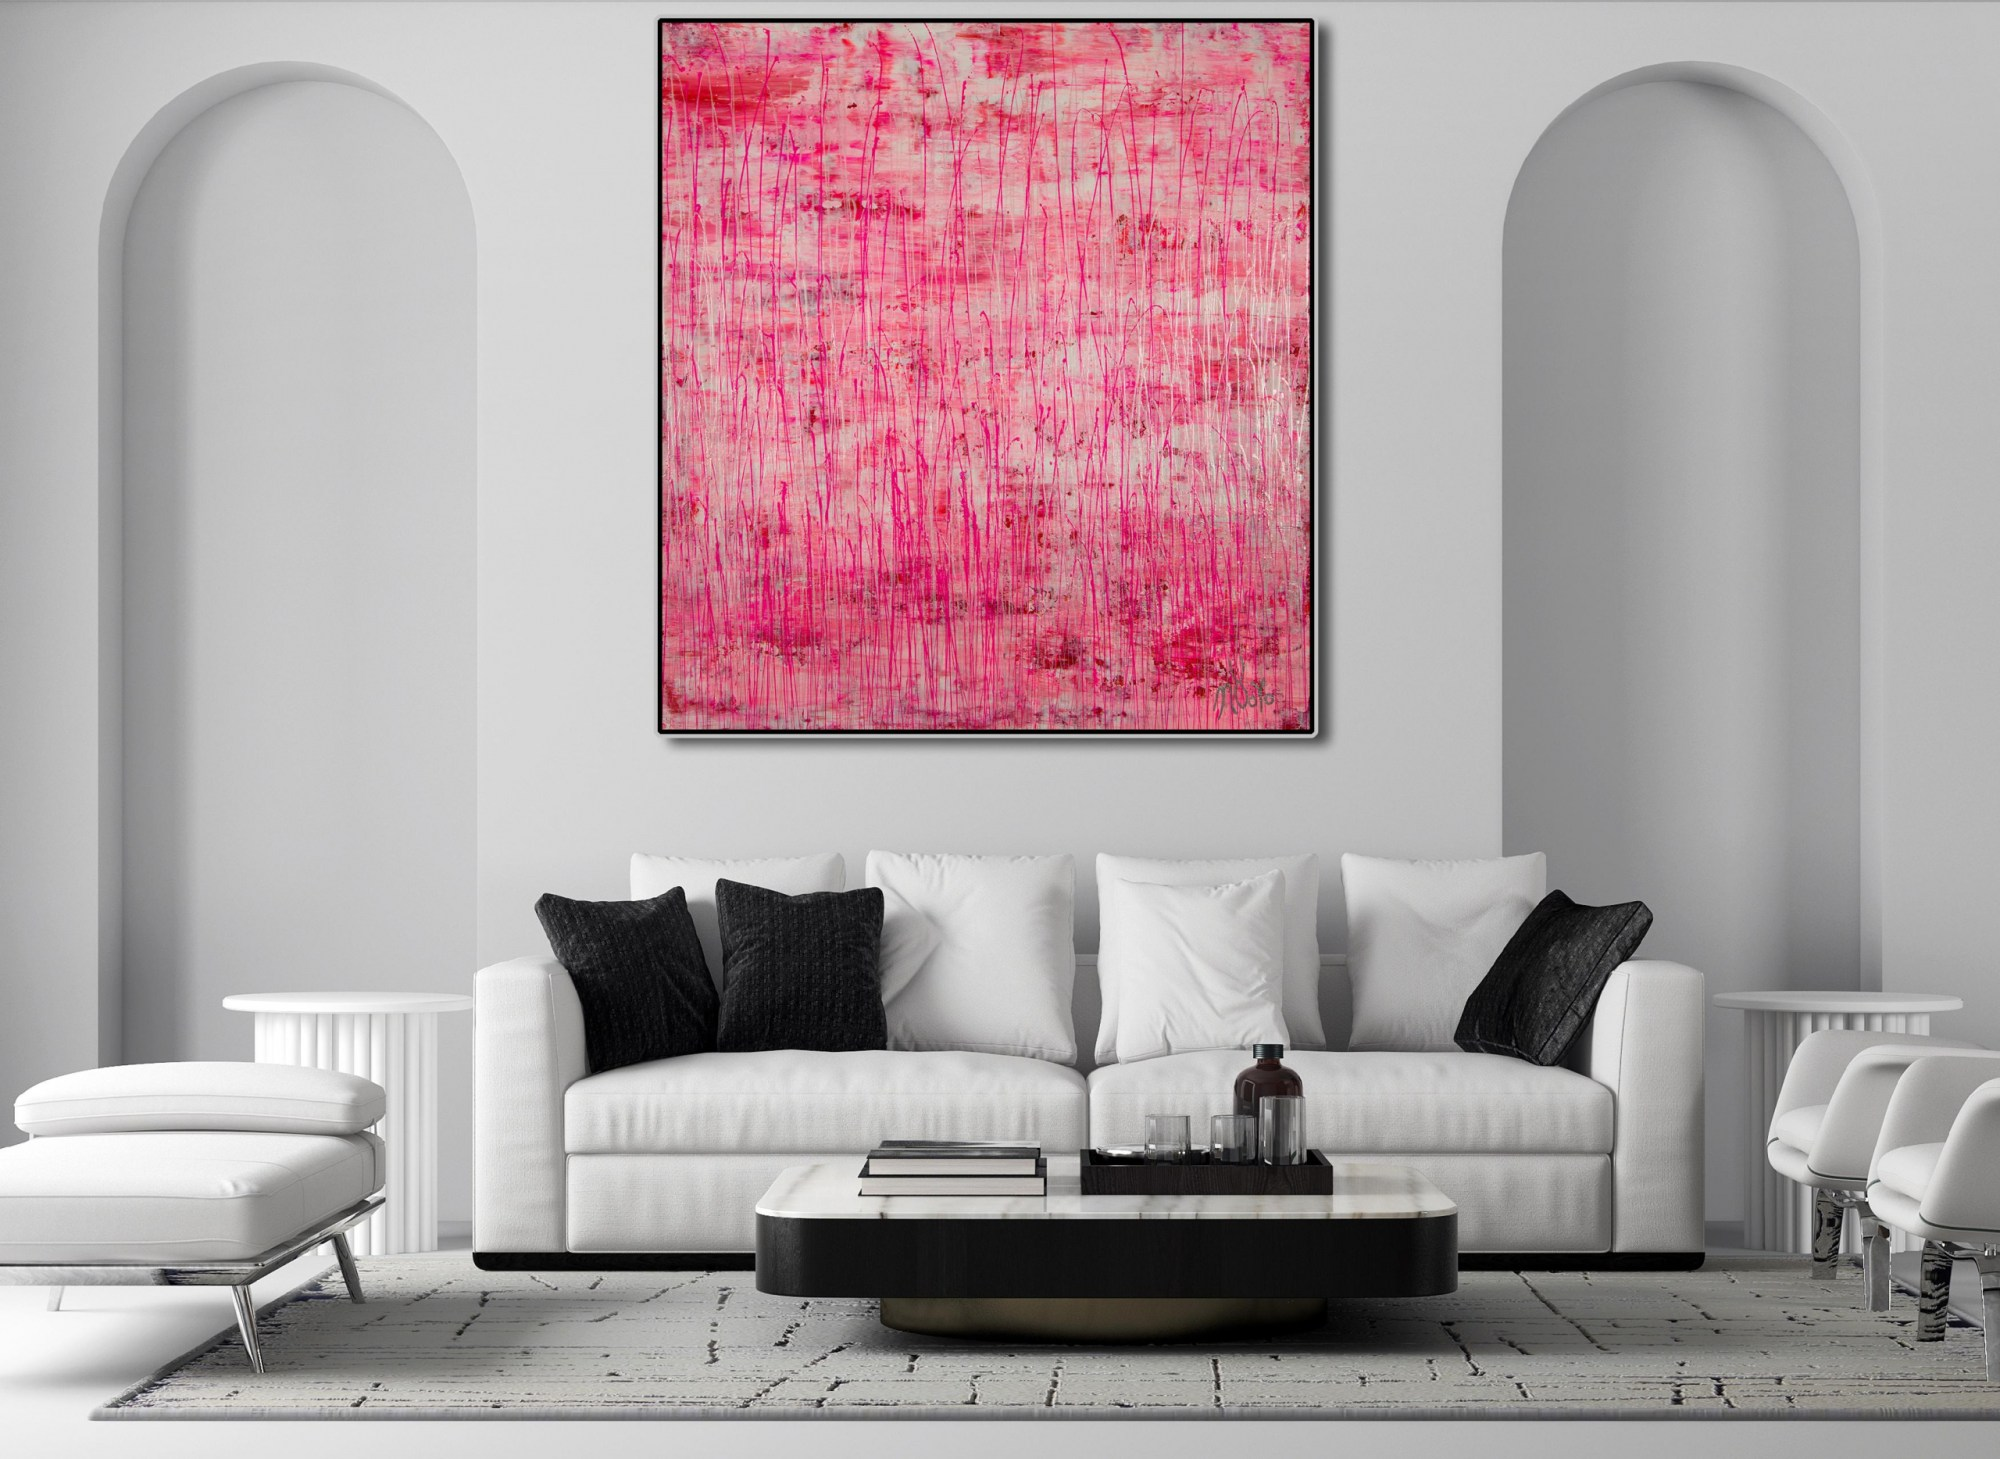 Room Example (framed) / Iridescent Drizzles (Rain in pink) (2021) / Artist - Nestor Toro